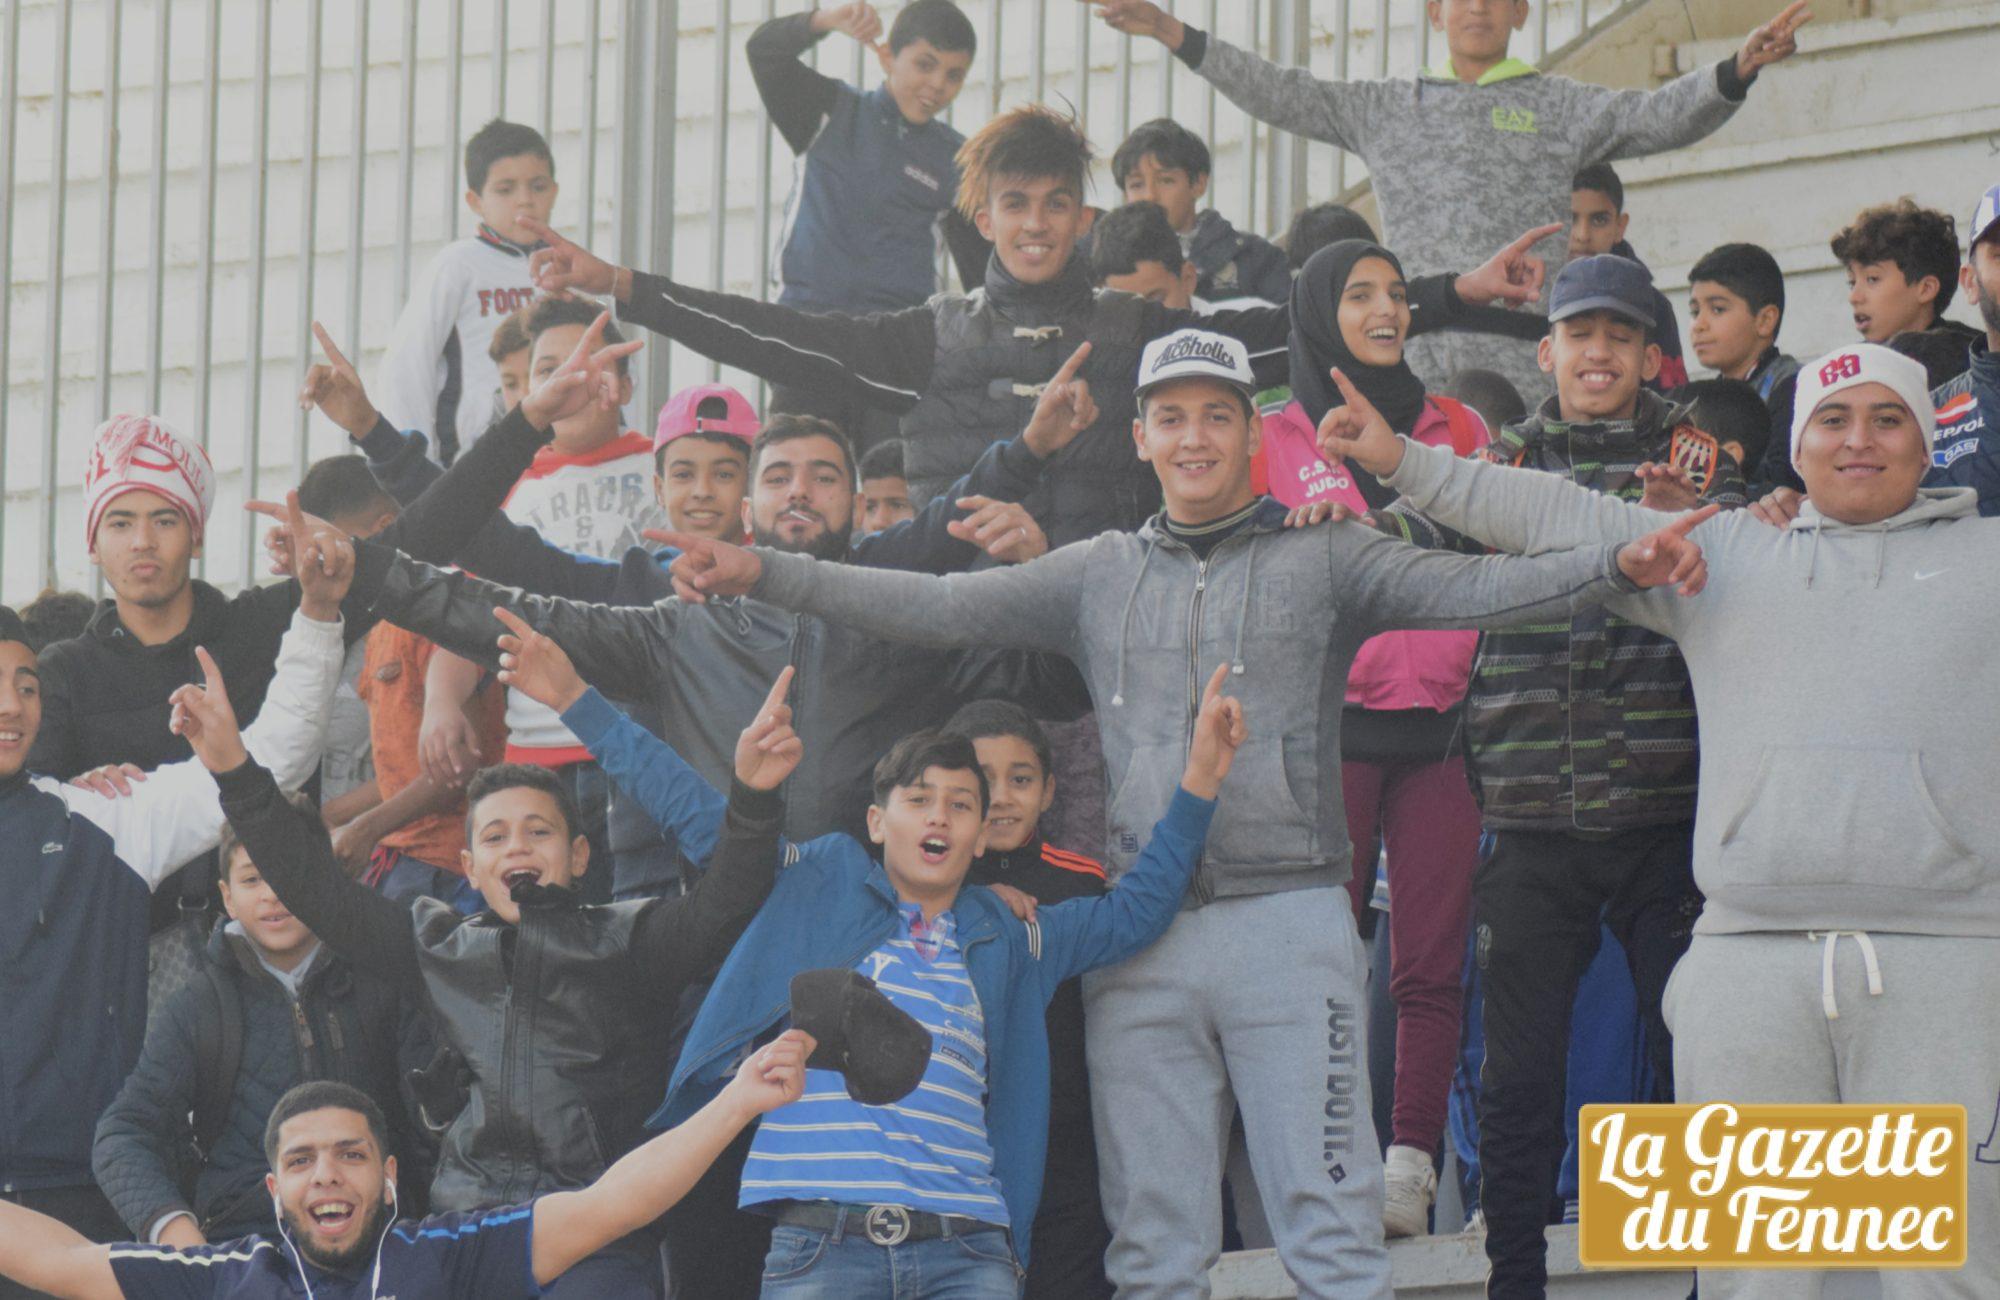 rugby-algerie-maroc-public-zabana-2